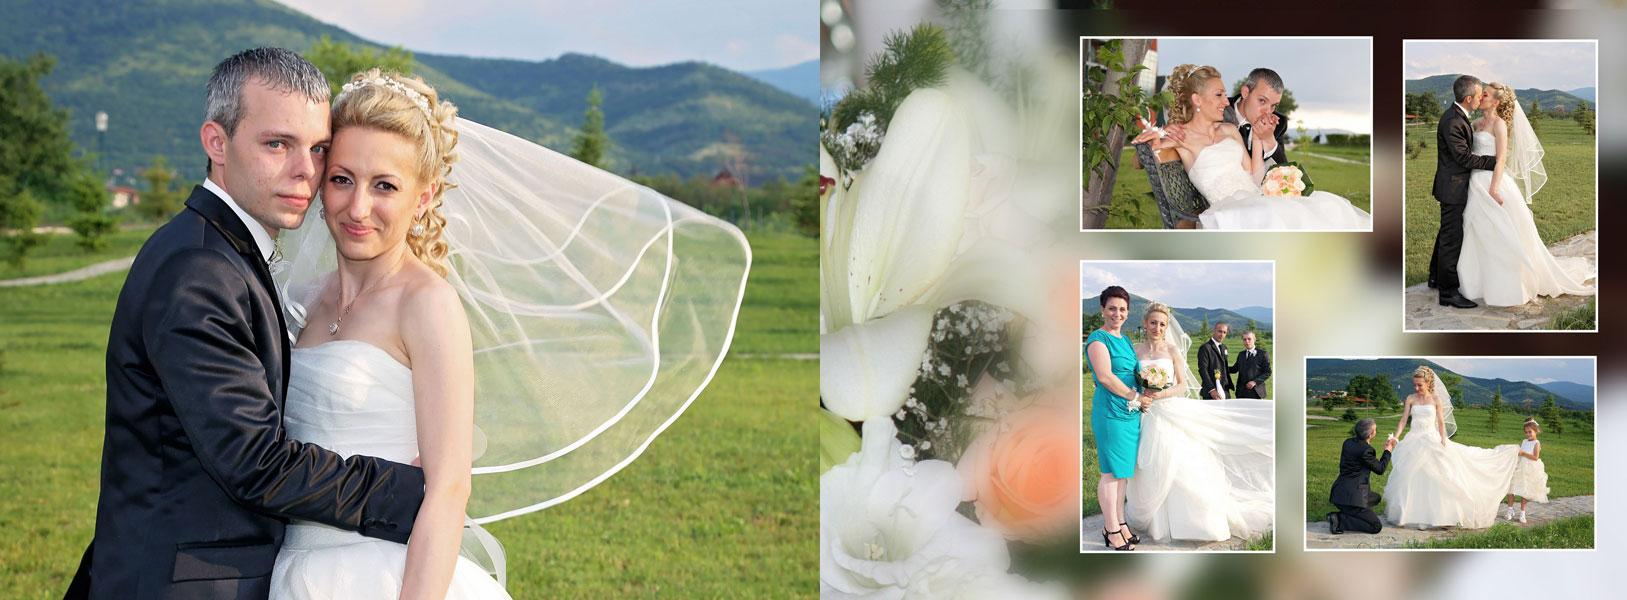 Drag Studio | Детска и сватбена фотография. | 16-17.jpg